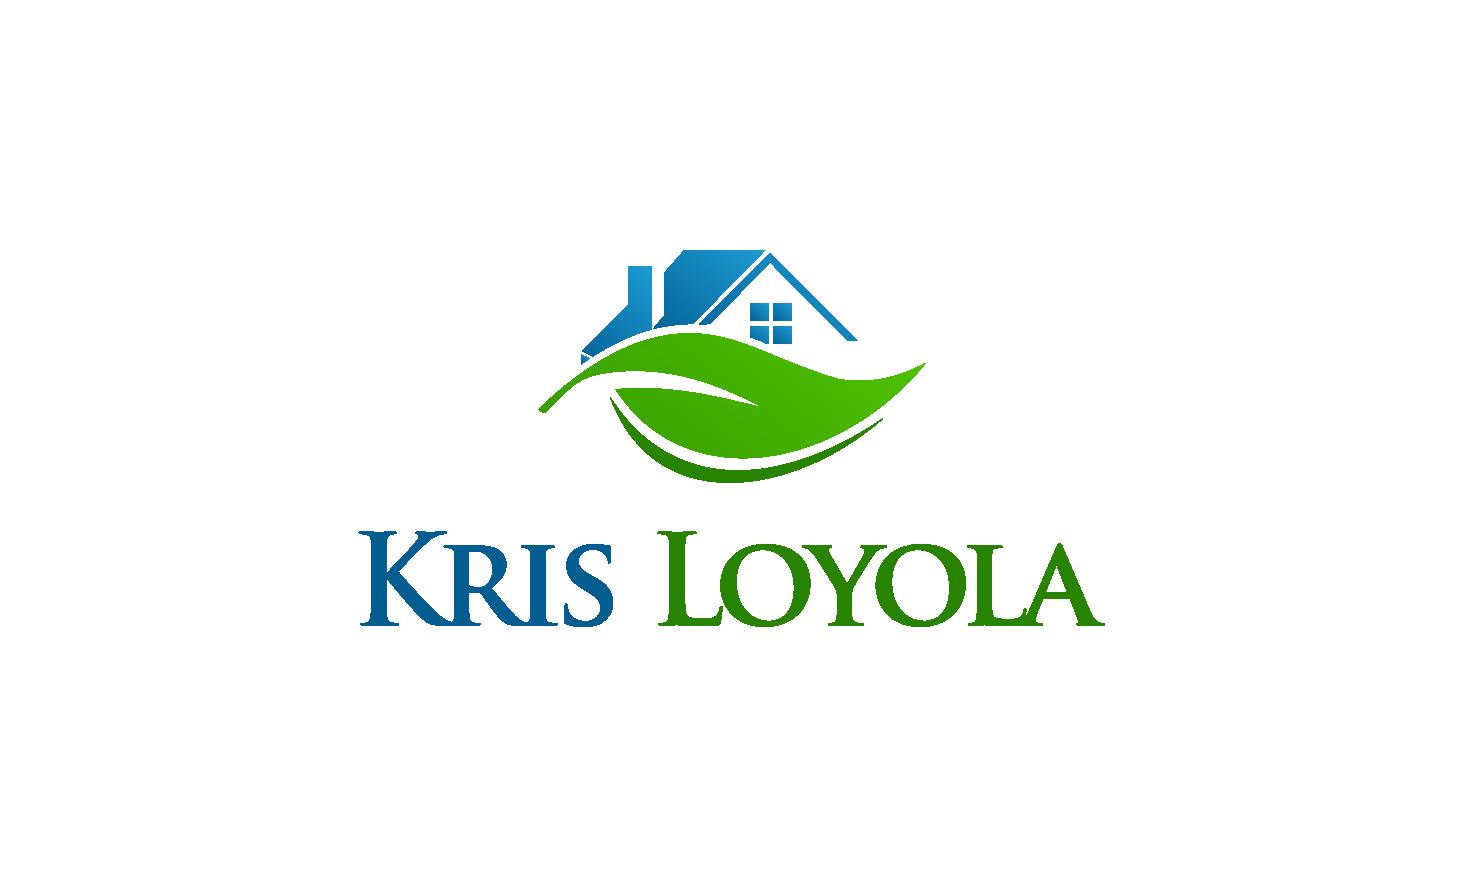 Logo Design by Muhammad Aslam - Entry No. 59 in the Logo Design Contest Kris Loyola Logo Design.